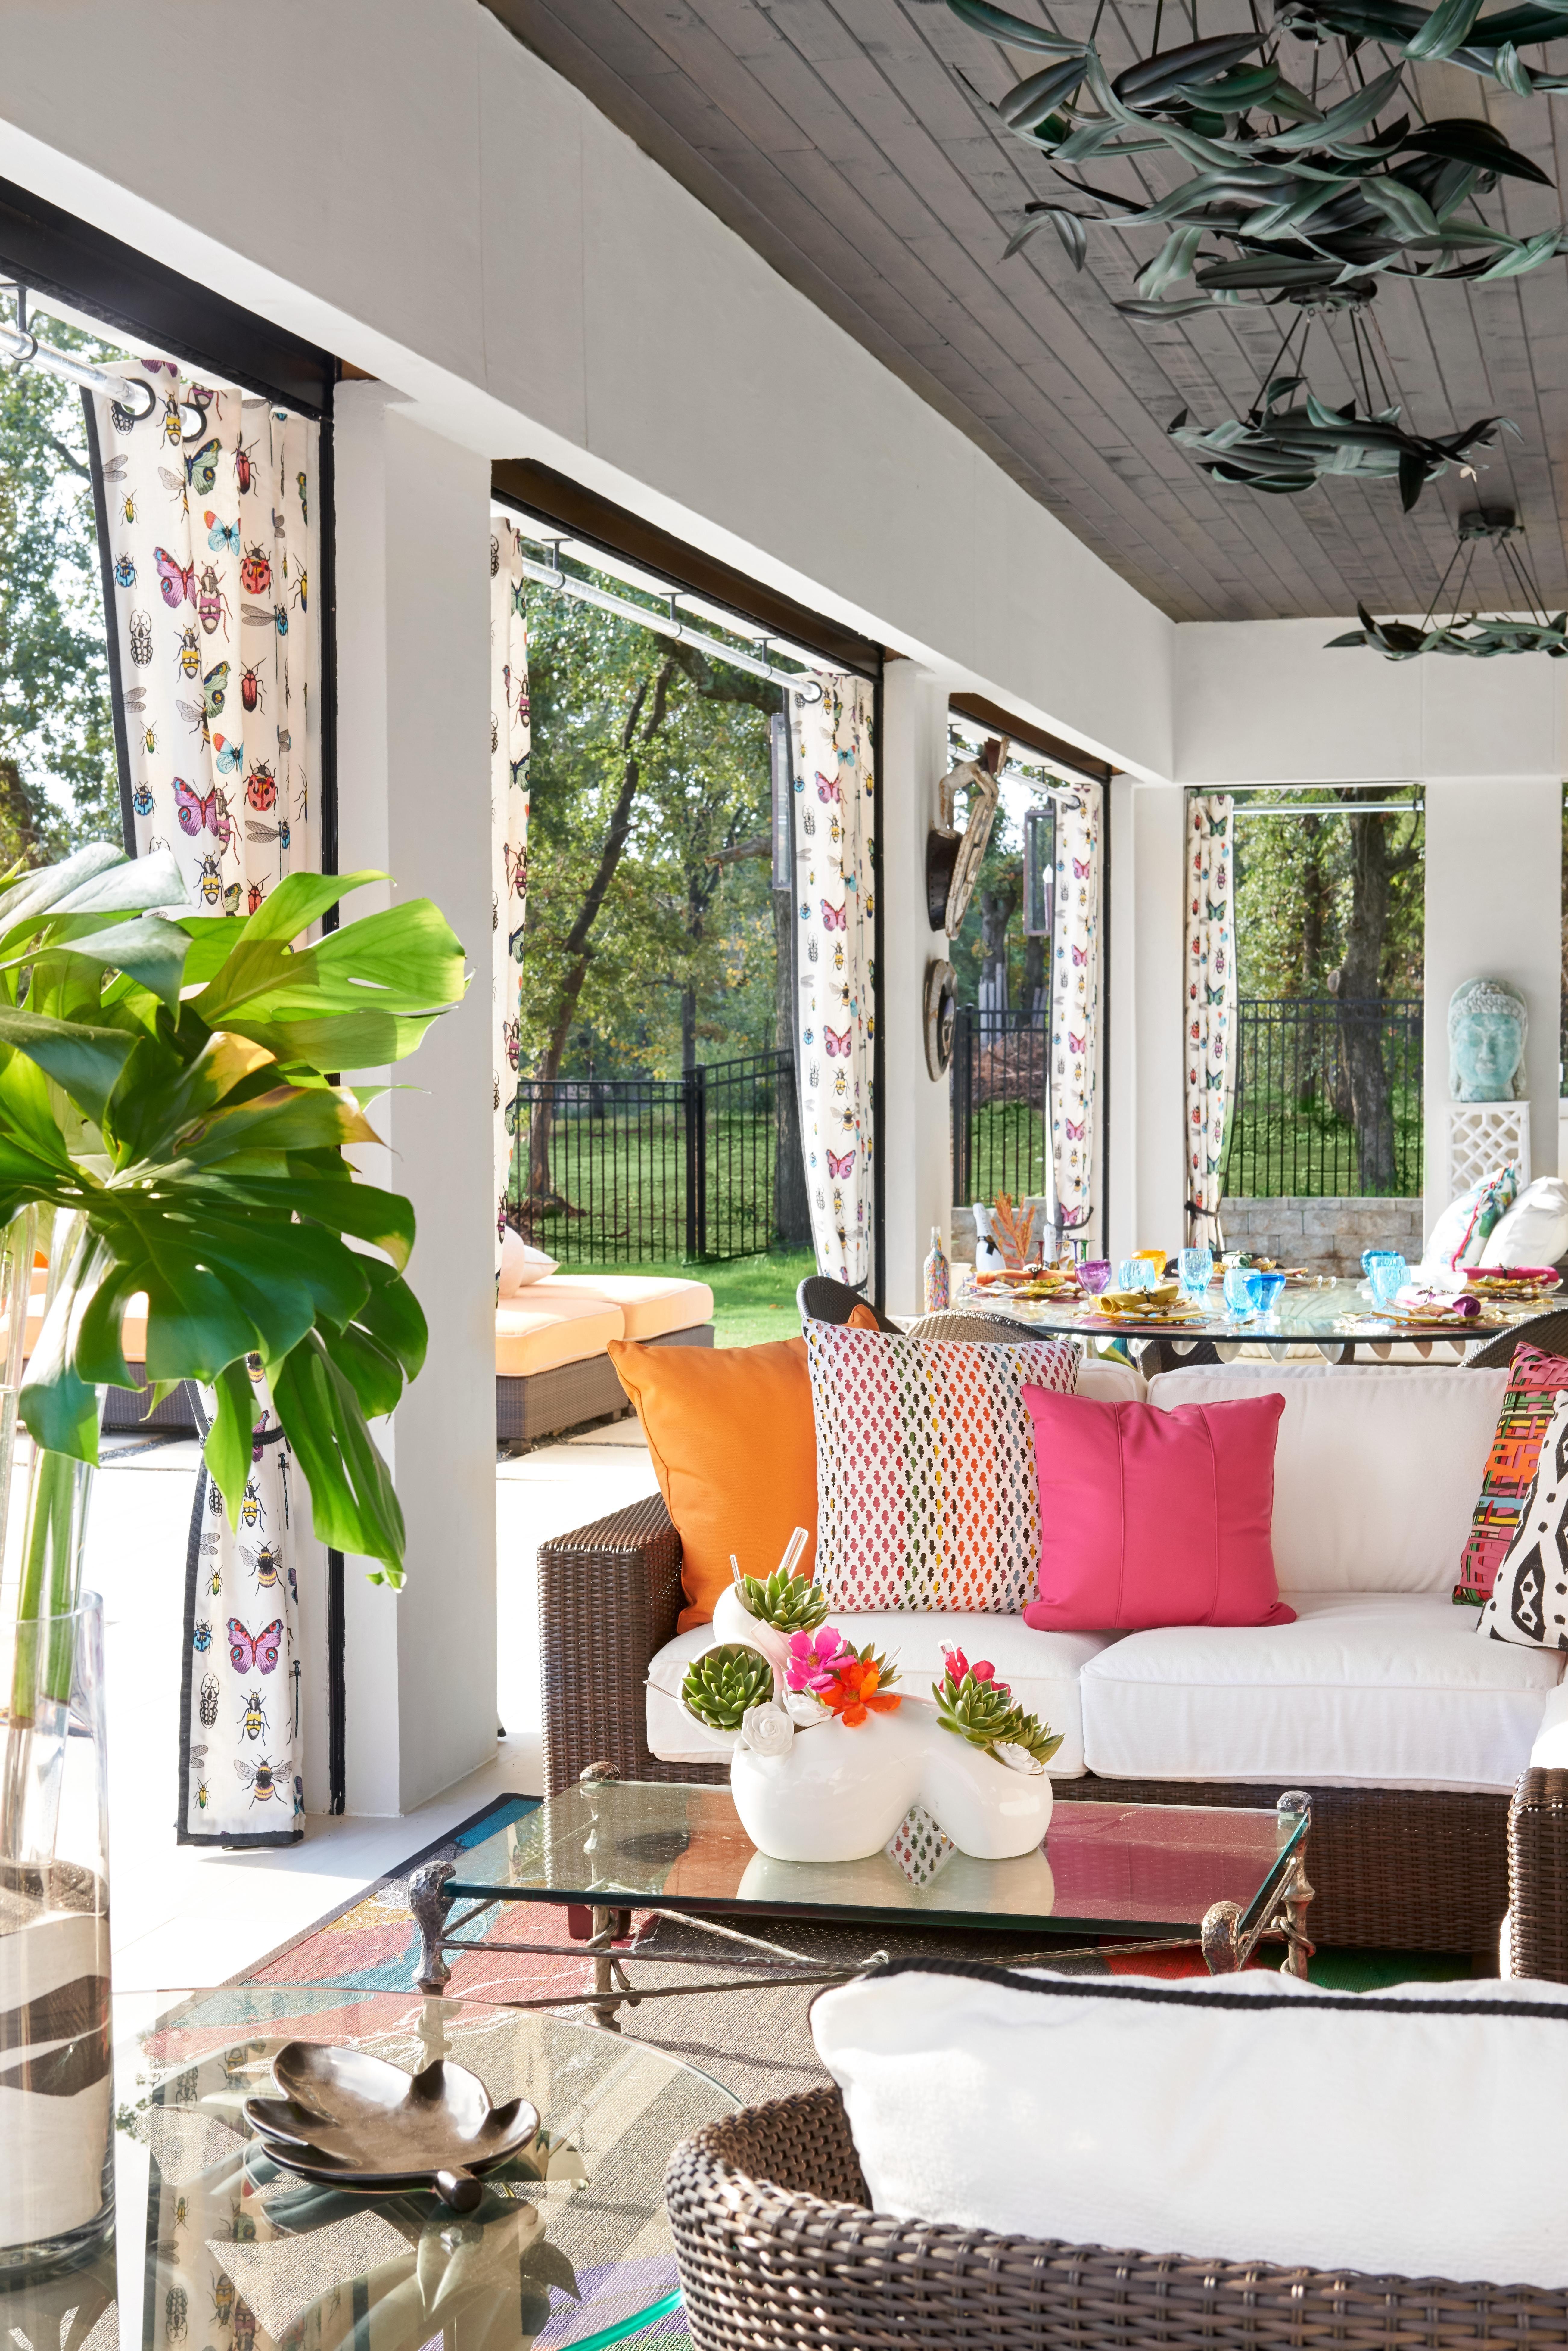 Colorful Backyard Decorating Ideas Apartment Patio Decor Colorful Patio Decor Colorful Patio